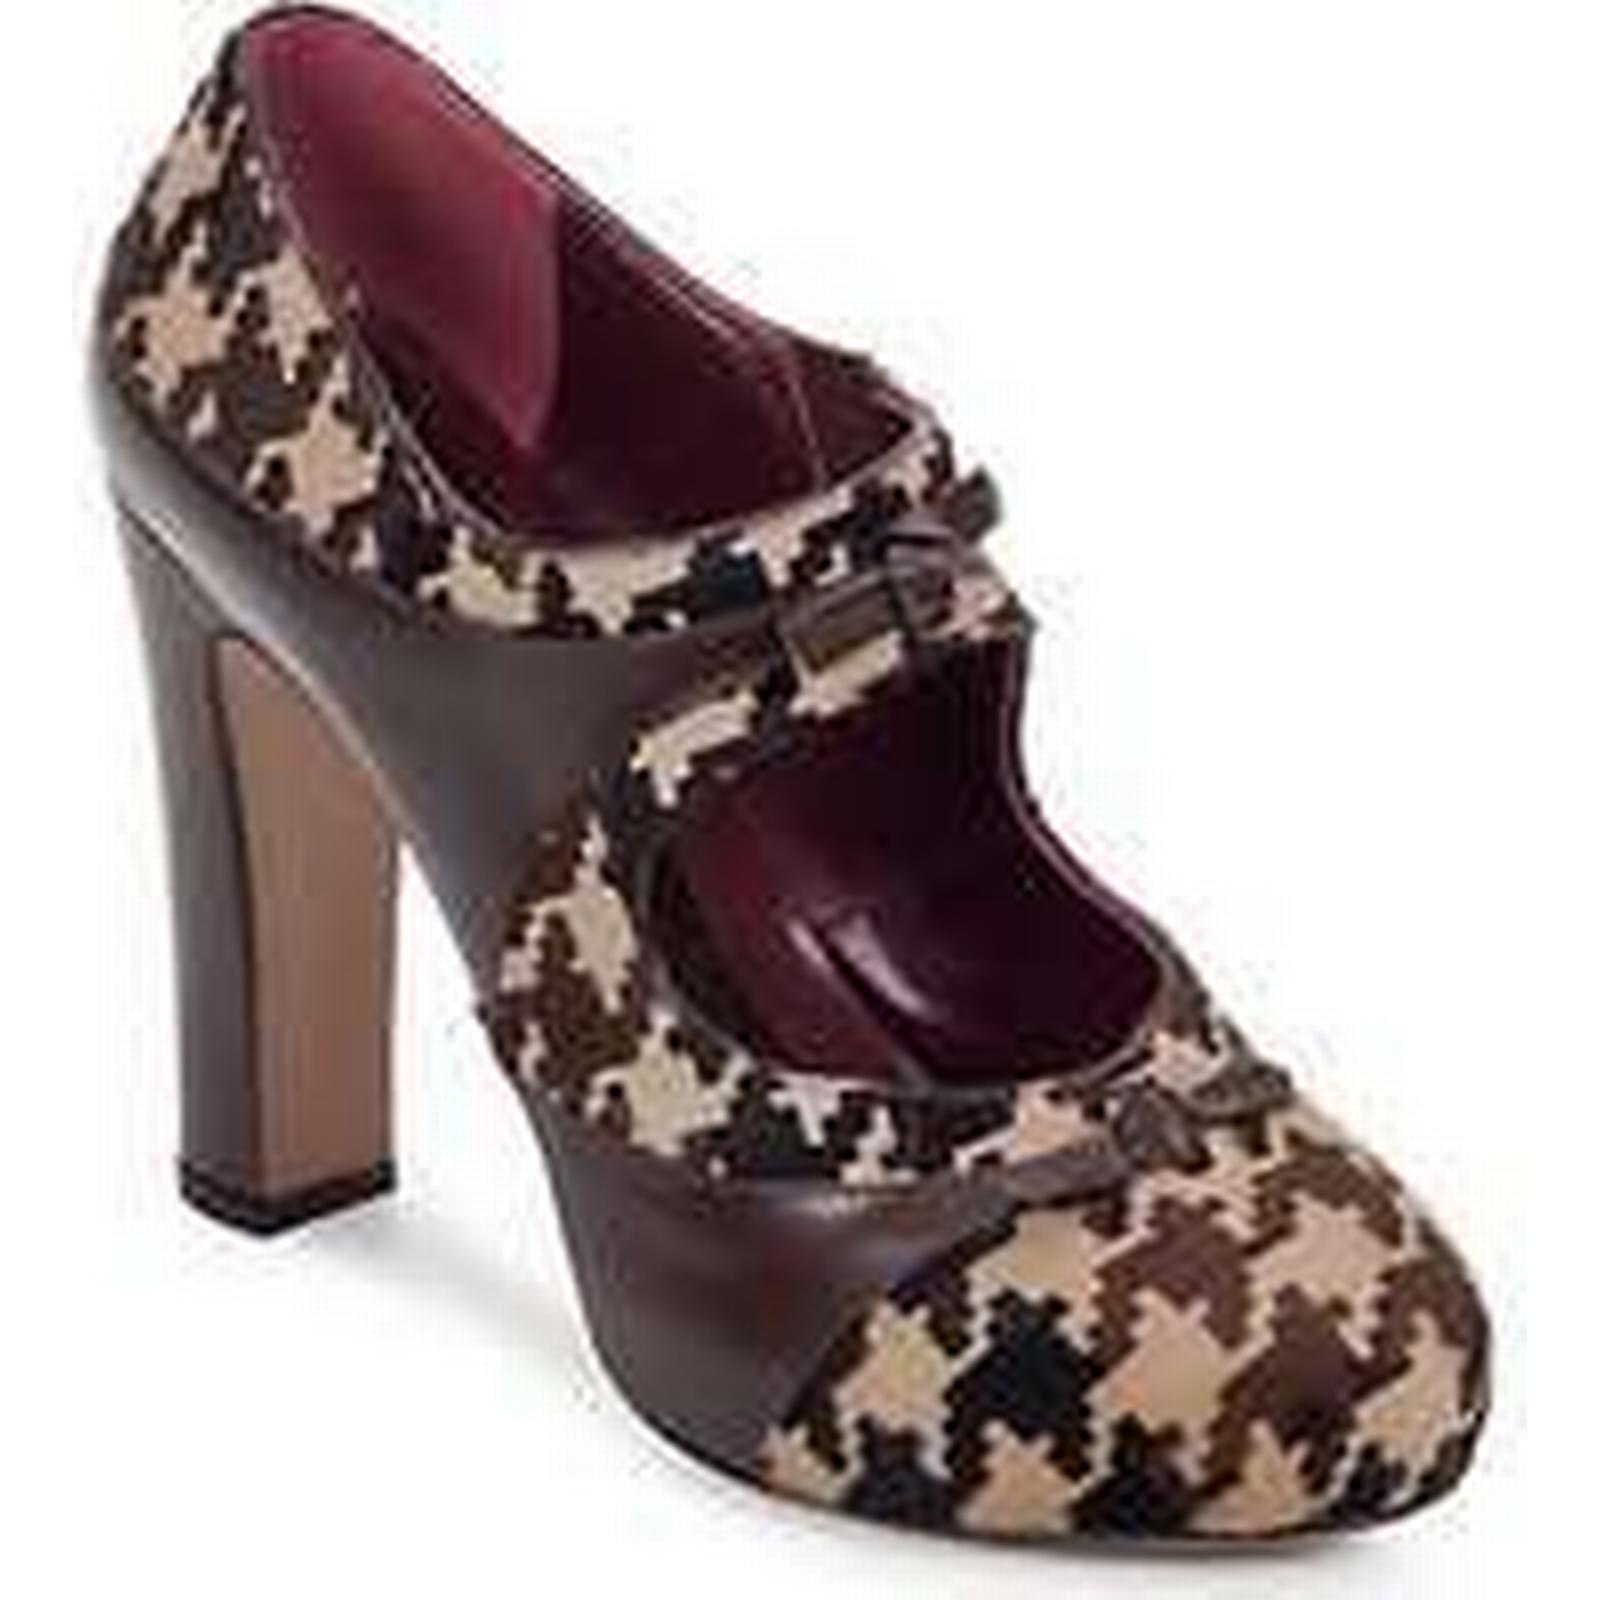 spartoo.co.uk antonio marras alina femmes & #  27; 27; 27; s cour chaussures Marron  f24956